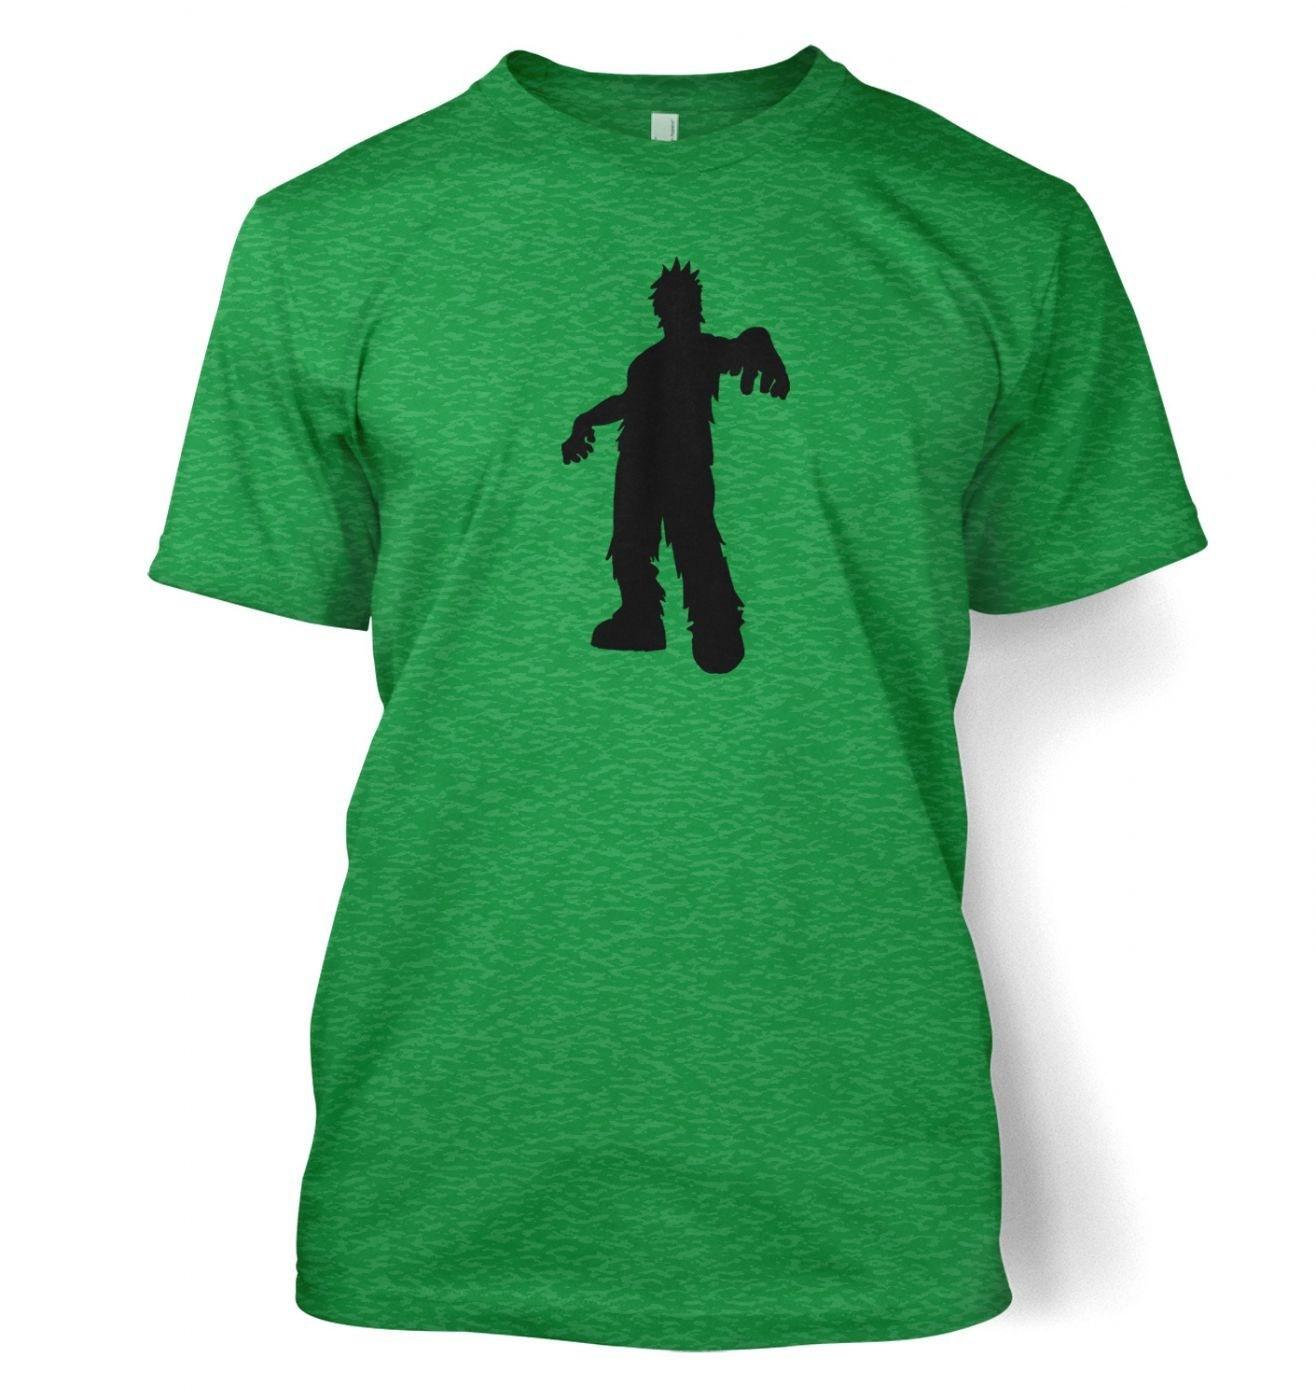 Zombie Silhouette men's t-shirt